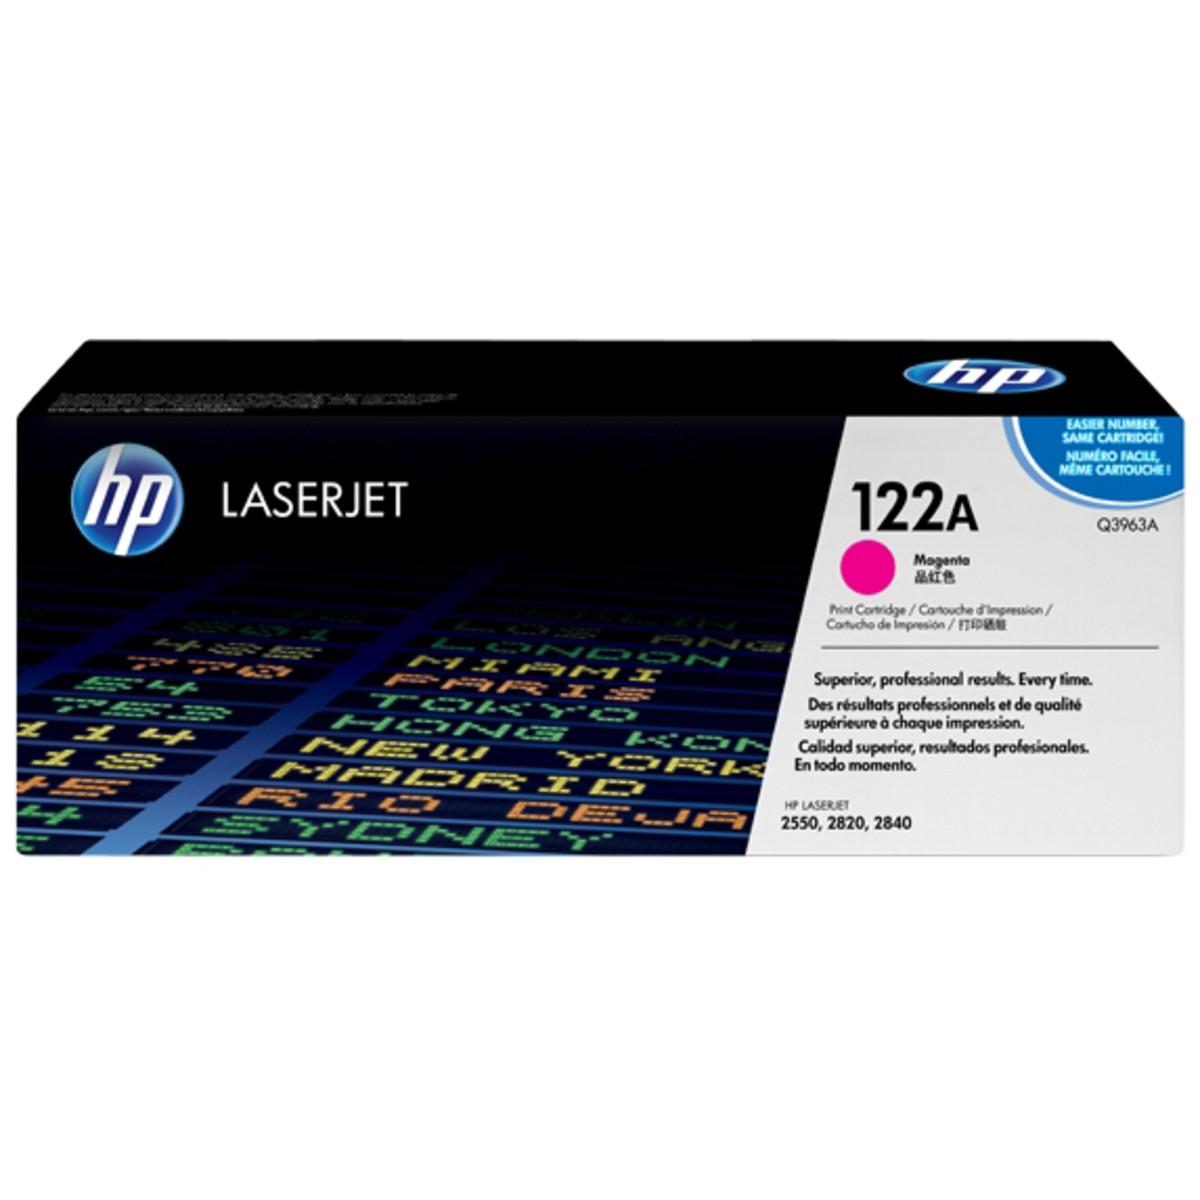 HP 122A (Q3963A) Magenta Toner Cartridge - High Yield